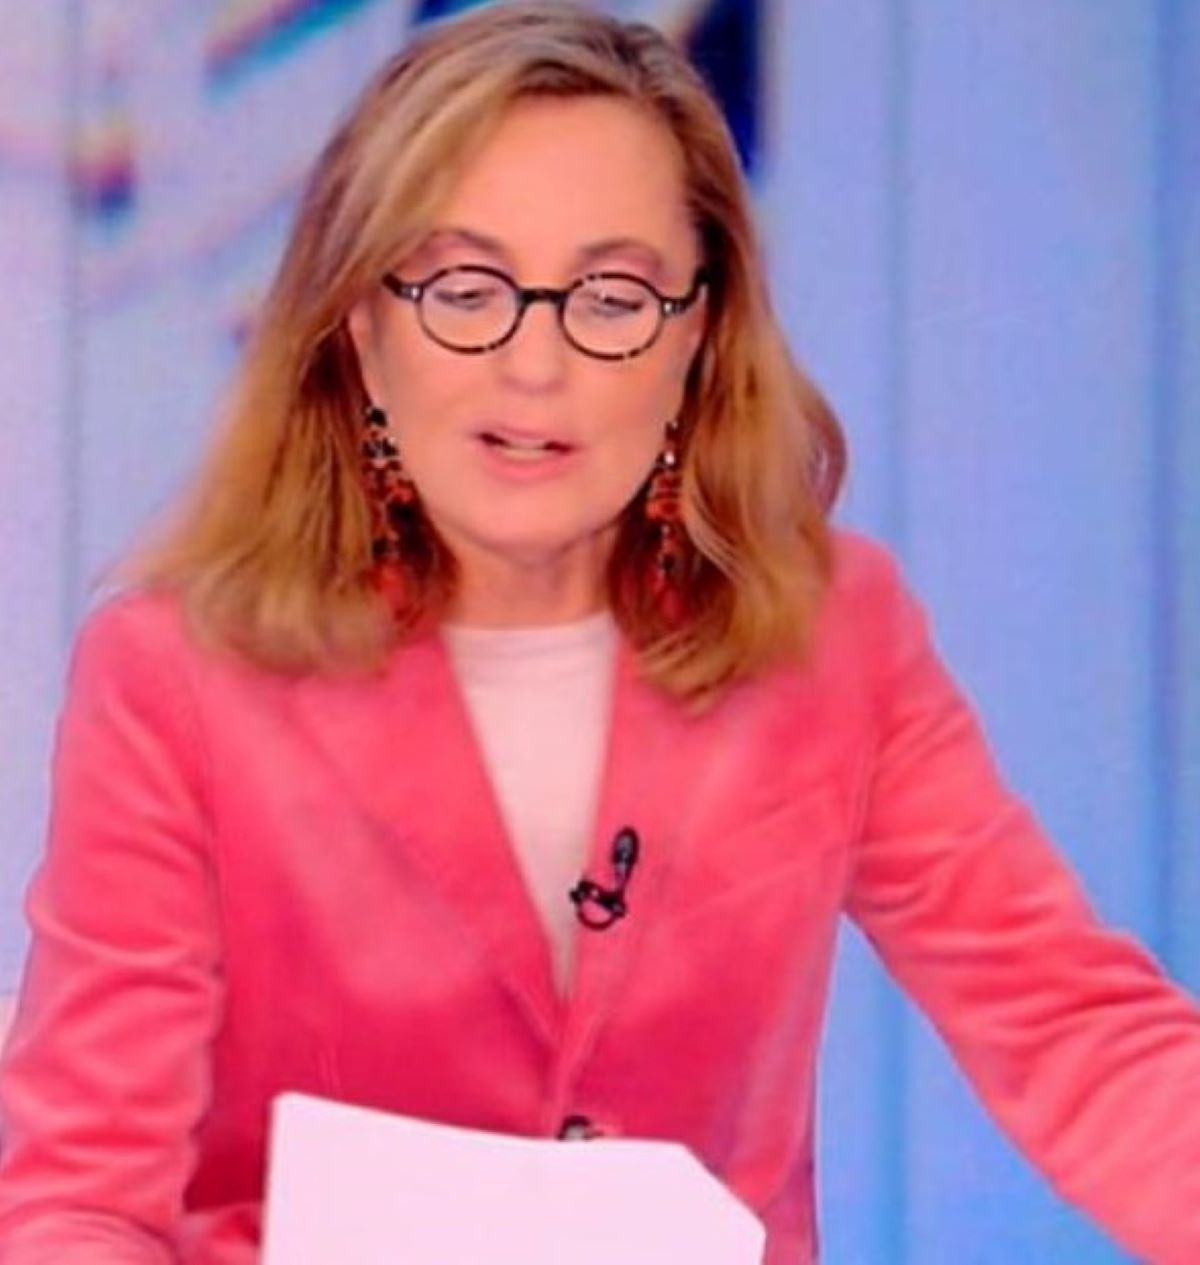 Barbara Palombelli Frasi Femminicidi Scuse Precisazioni